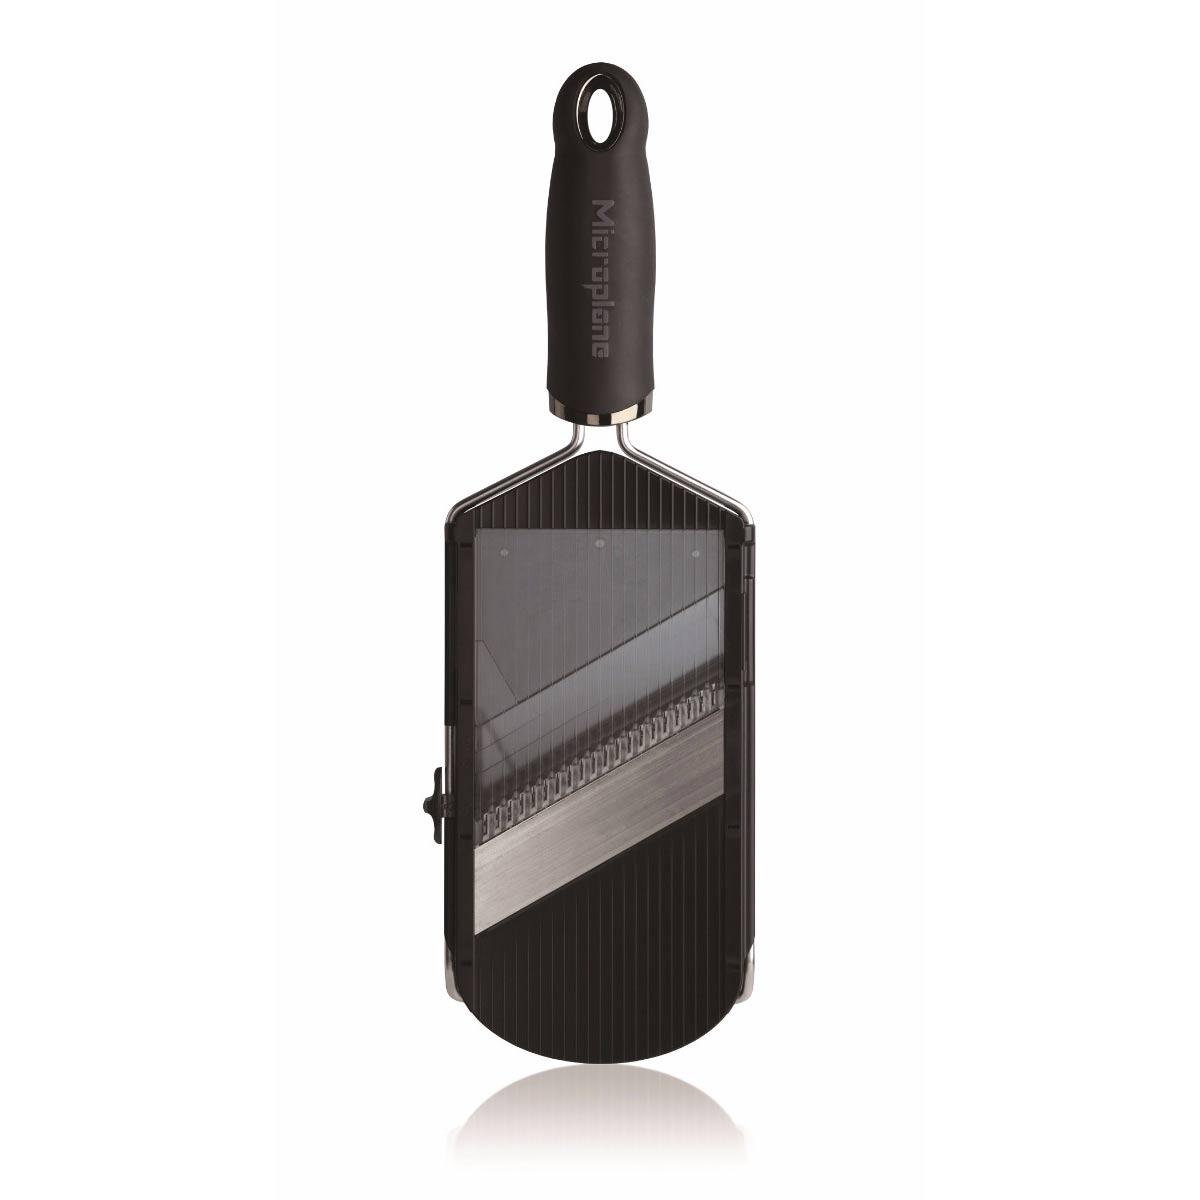 Онлайн каталог PROMENU: Терка-слайсер Microplane SPECIALTY, 12х4х1 см, черная (34040) Microplane 34040